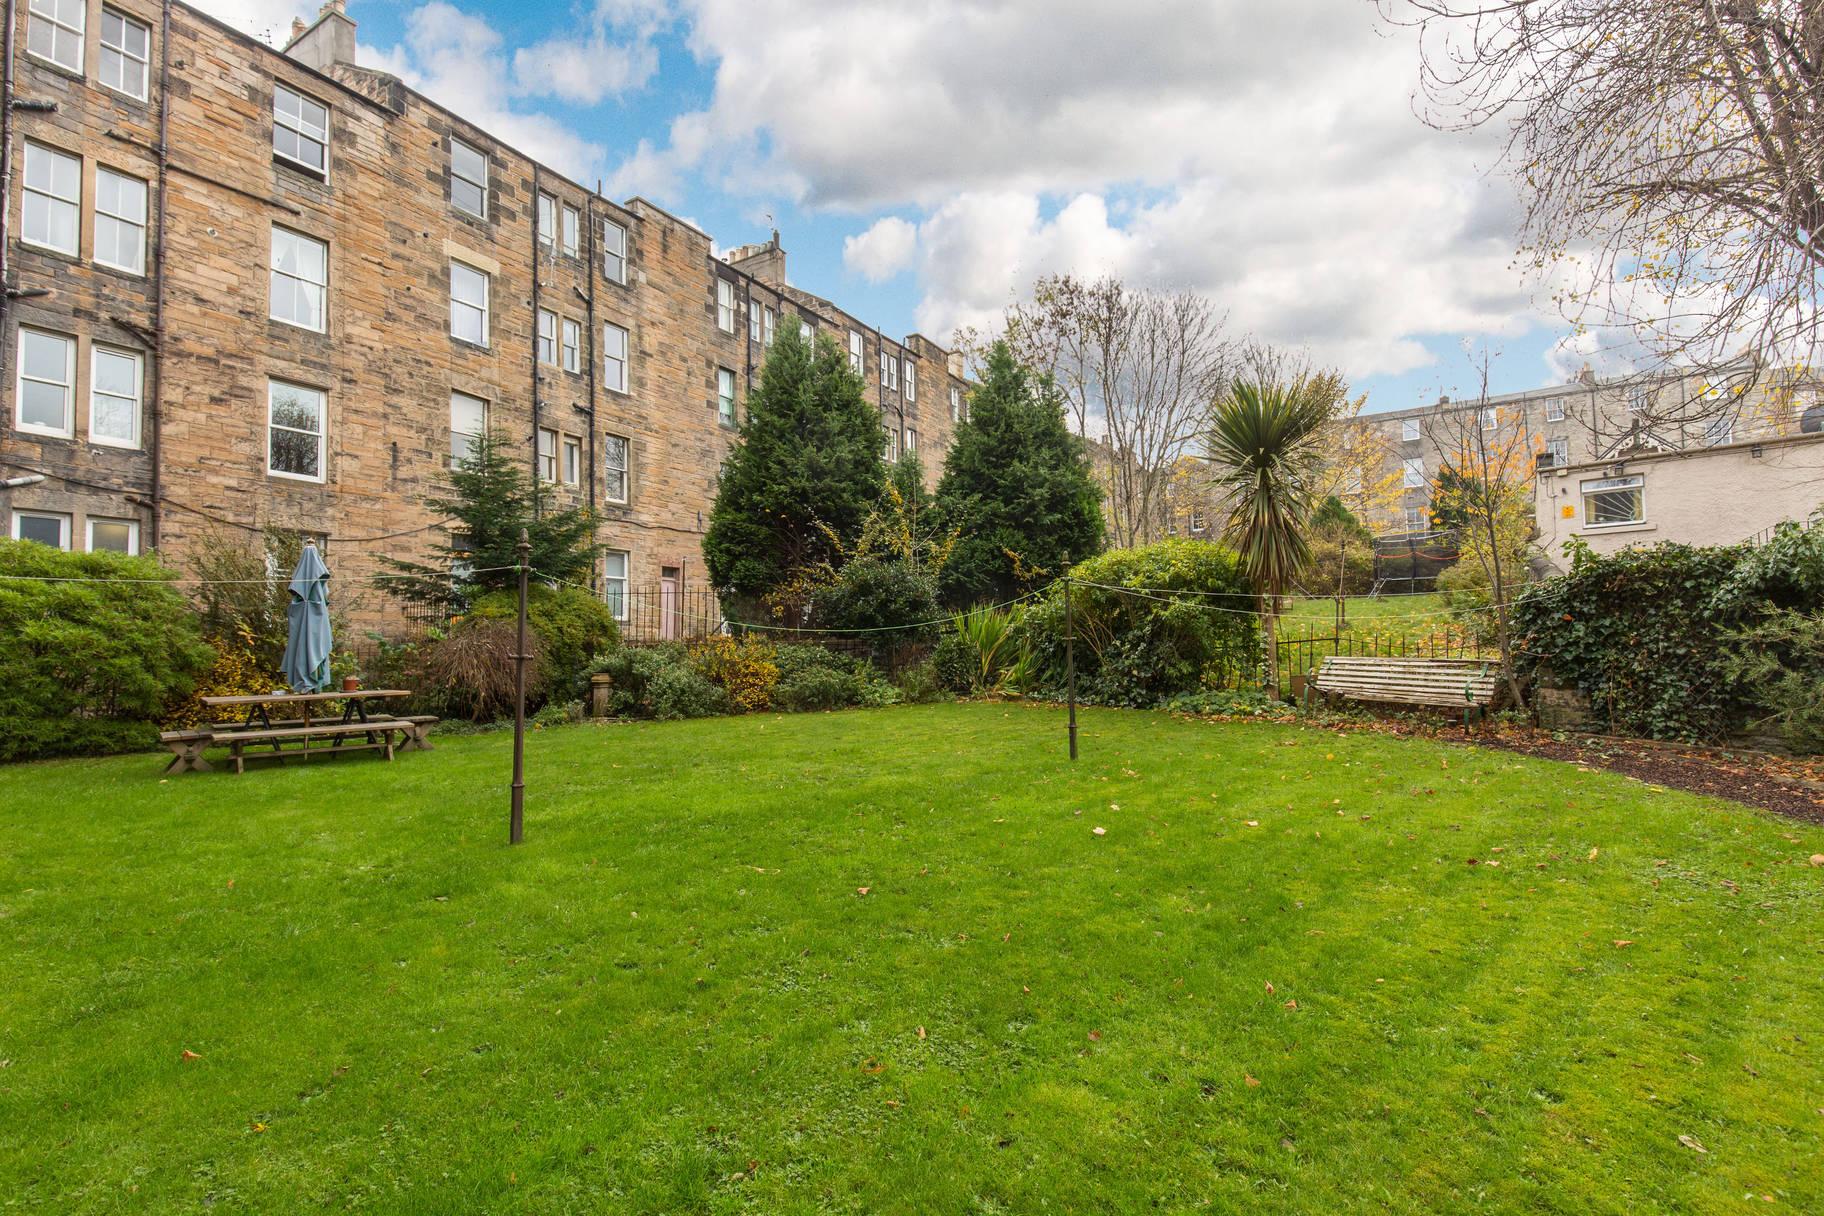 148 (1F2) Brunton Gardens, Hillside, Edinburgh, EH7 5ET